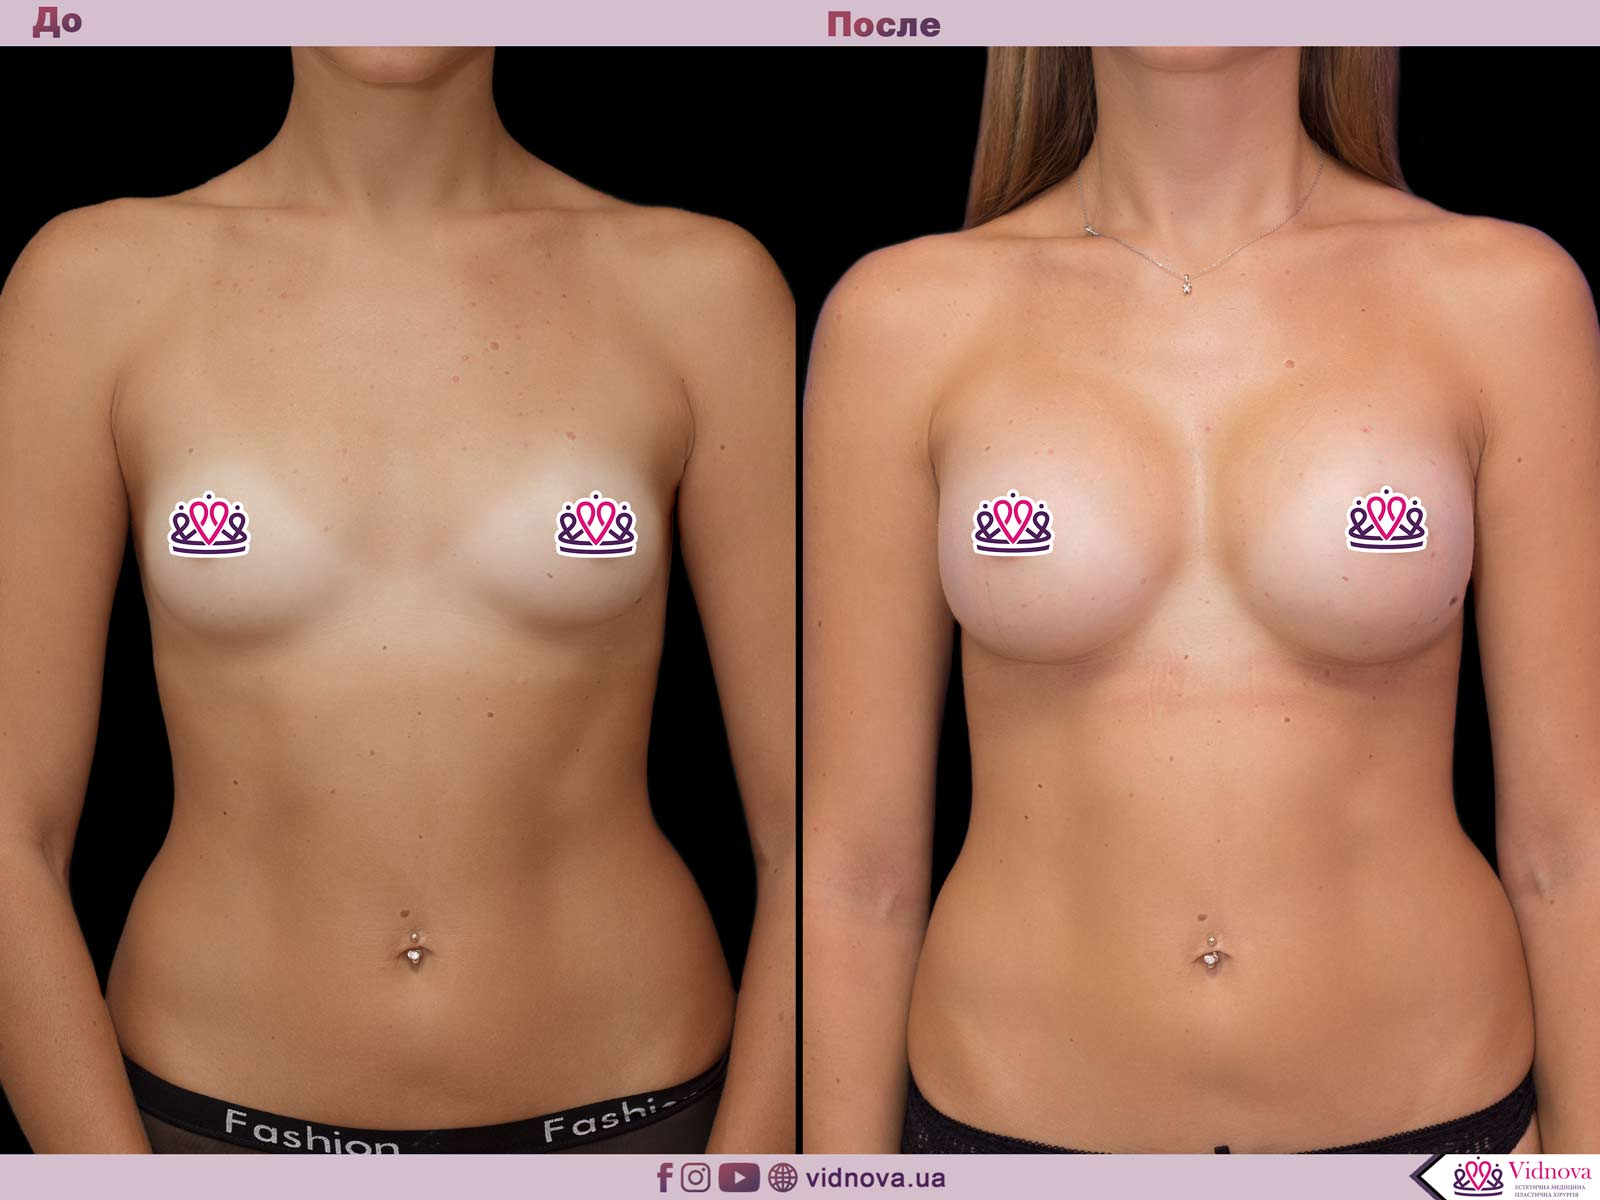 Увеличение груди: Фото ДО и ПОСЛЕ - Пример №44-1 - Клиника Vidnova